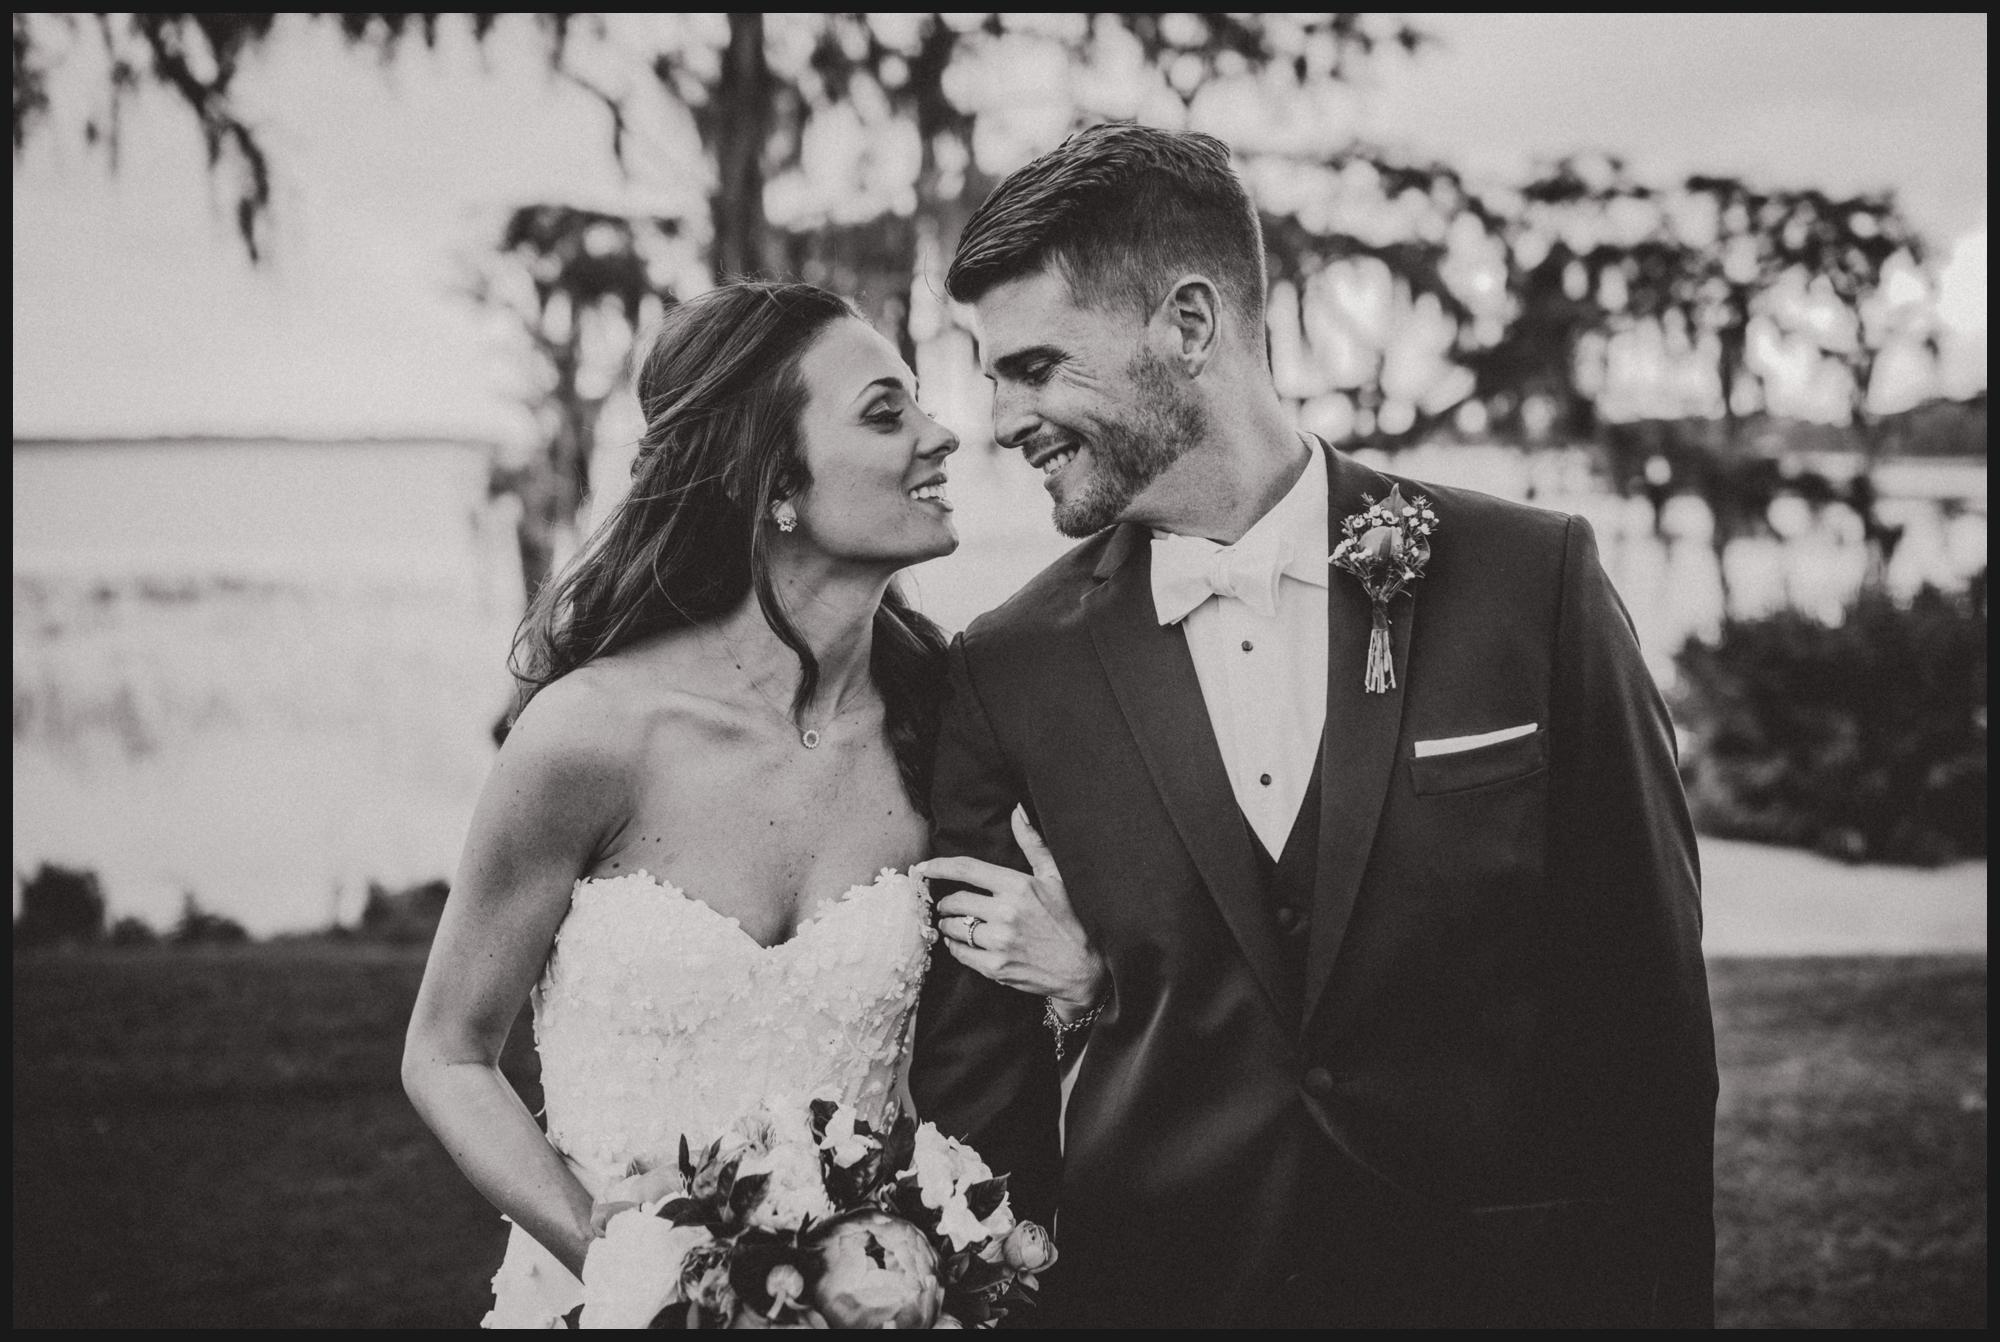 Orlando-Wedding-Photographer-destination-wedding-photographer-florida-wedding-photographer-hawaii-wedding-photographer_0236.jpg